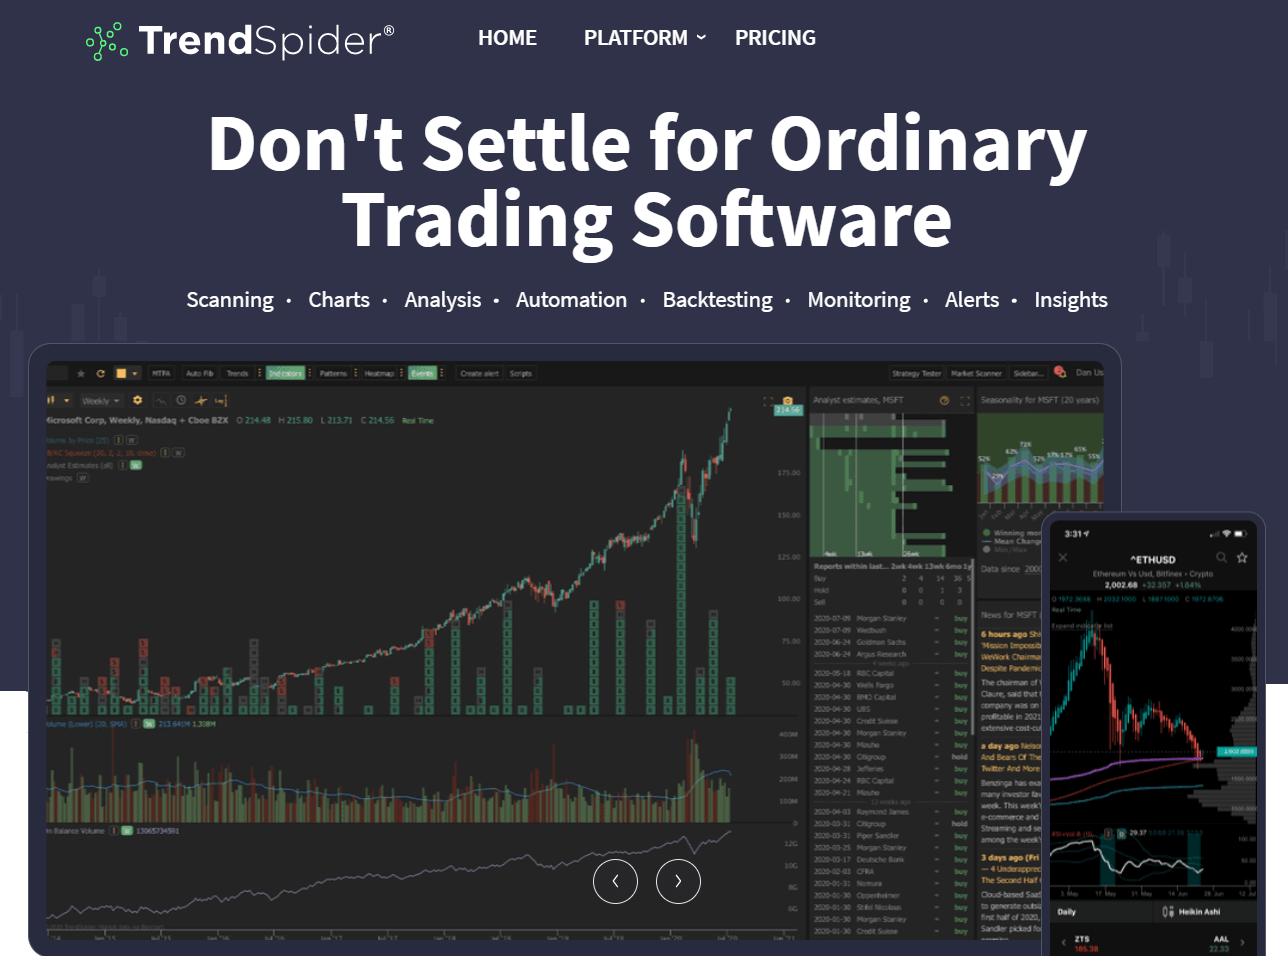 trendspider stock analysis app